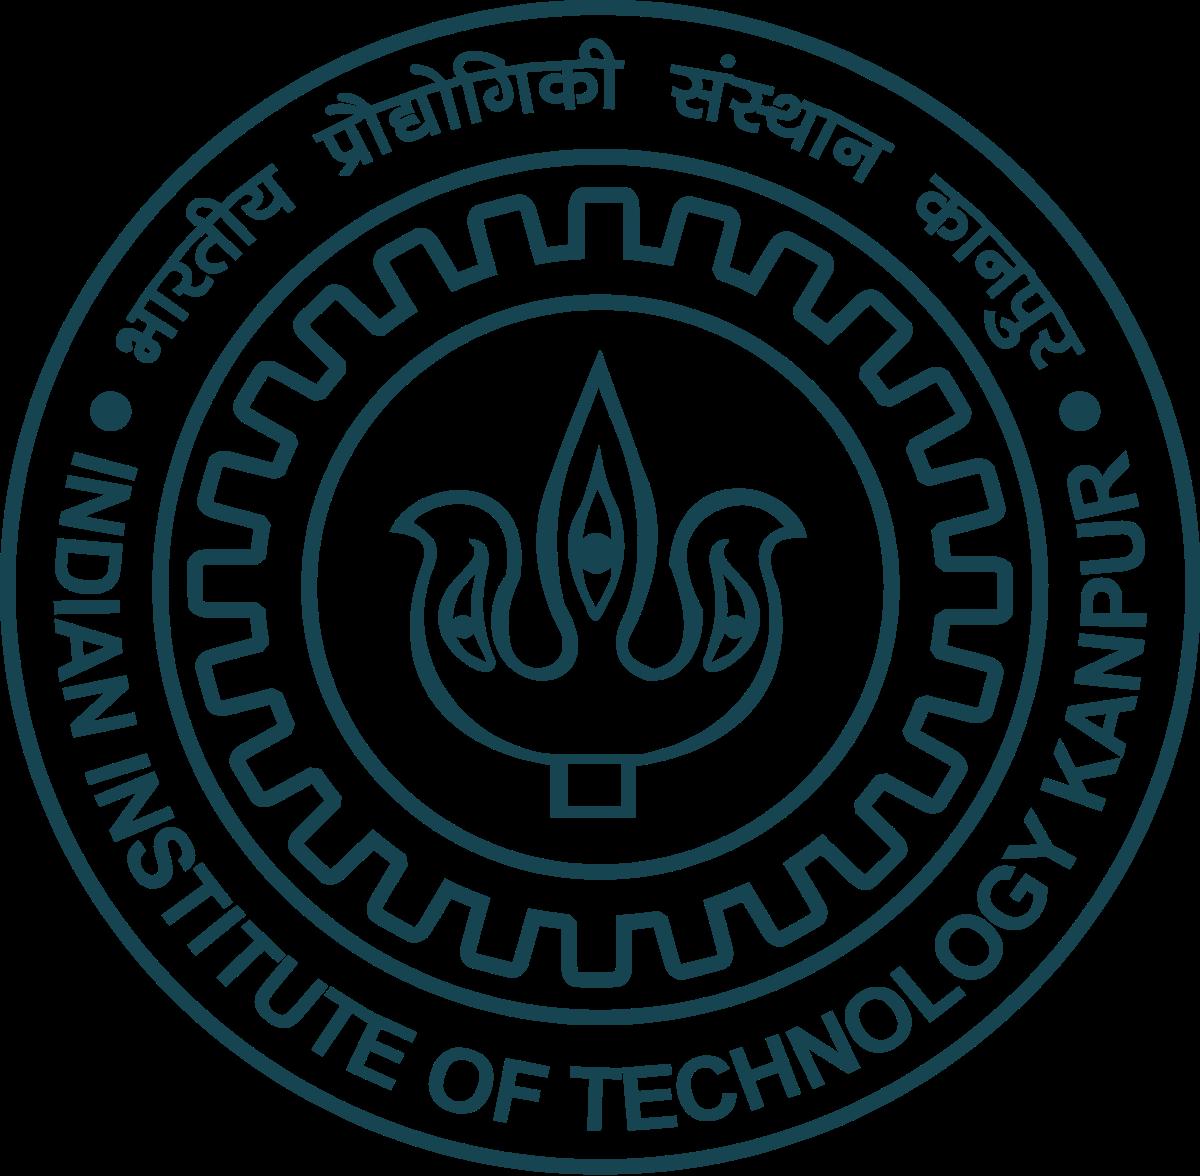 IIT Kanpur Recruitment 2021: Project Technician Post Vacancy -15 Feb 2021